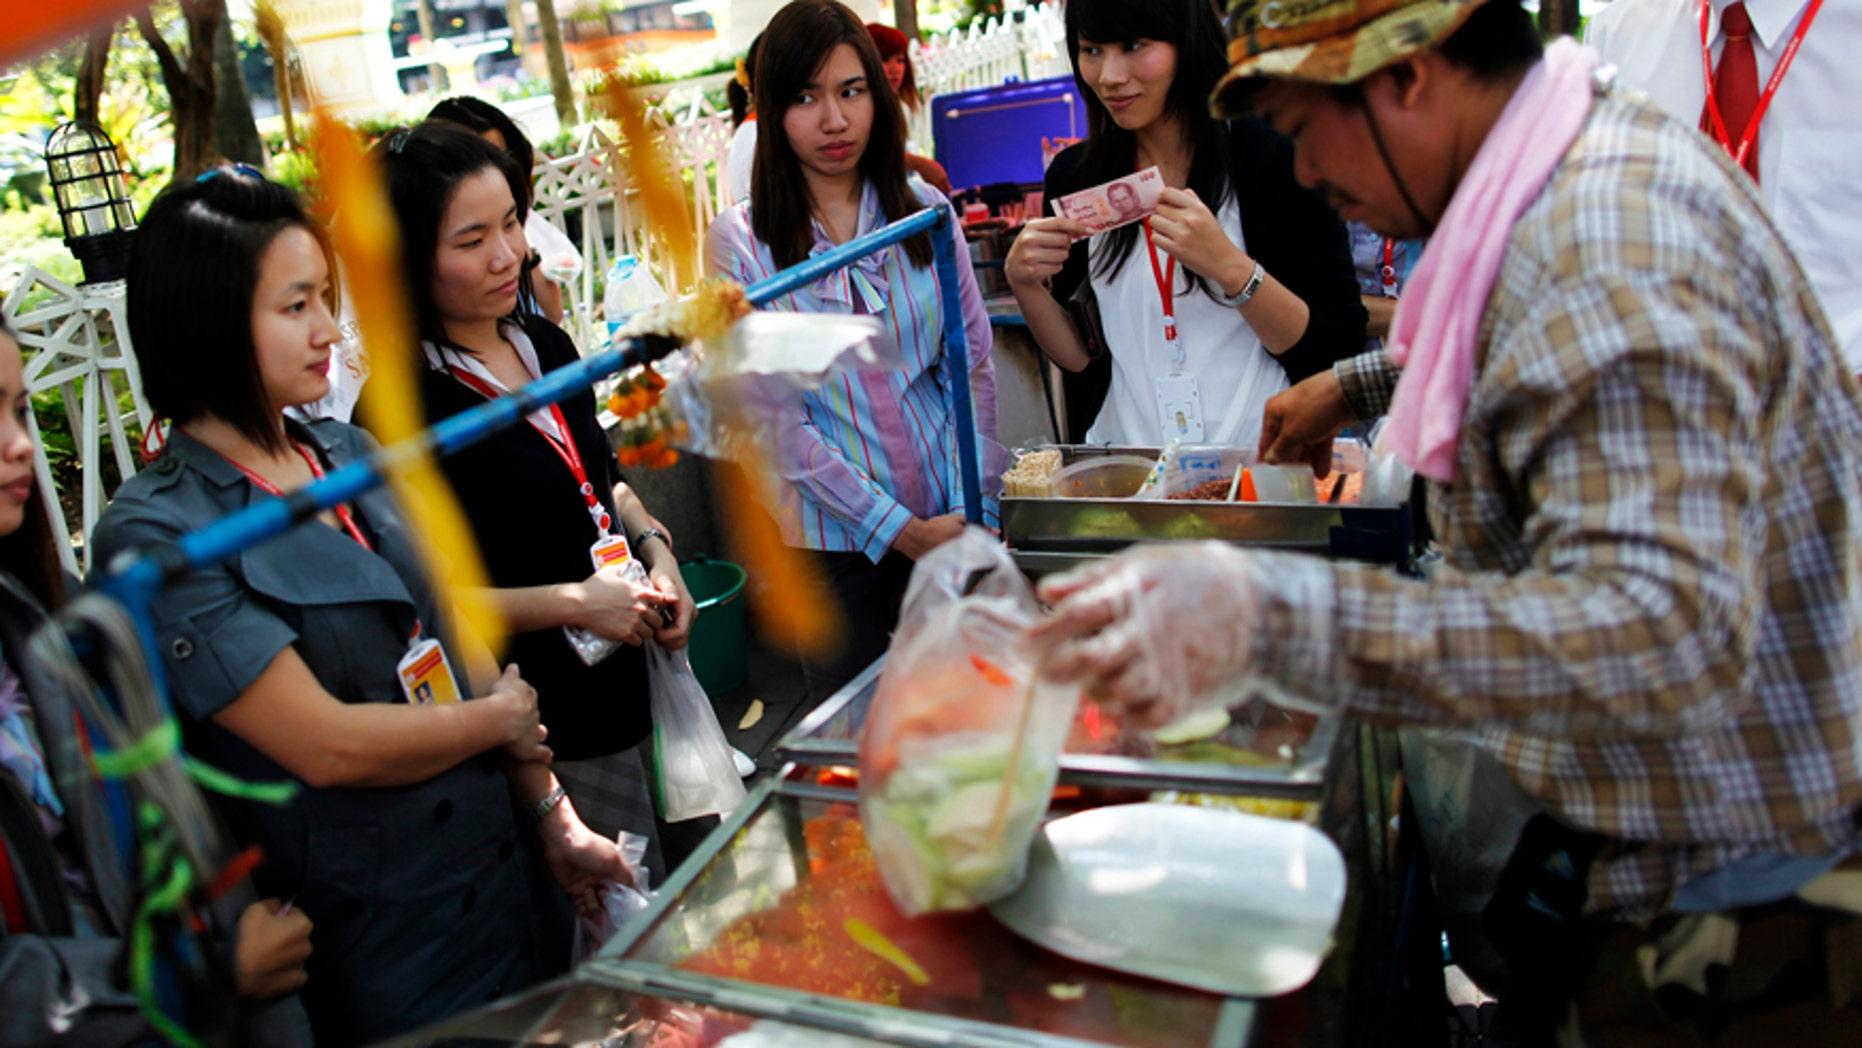 Street vendors hawk their wares in Bangkok, Thailand.